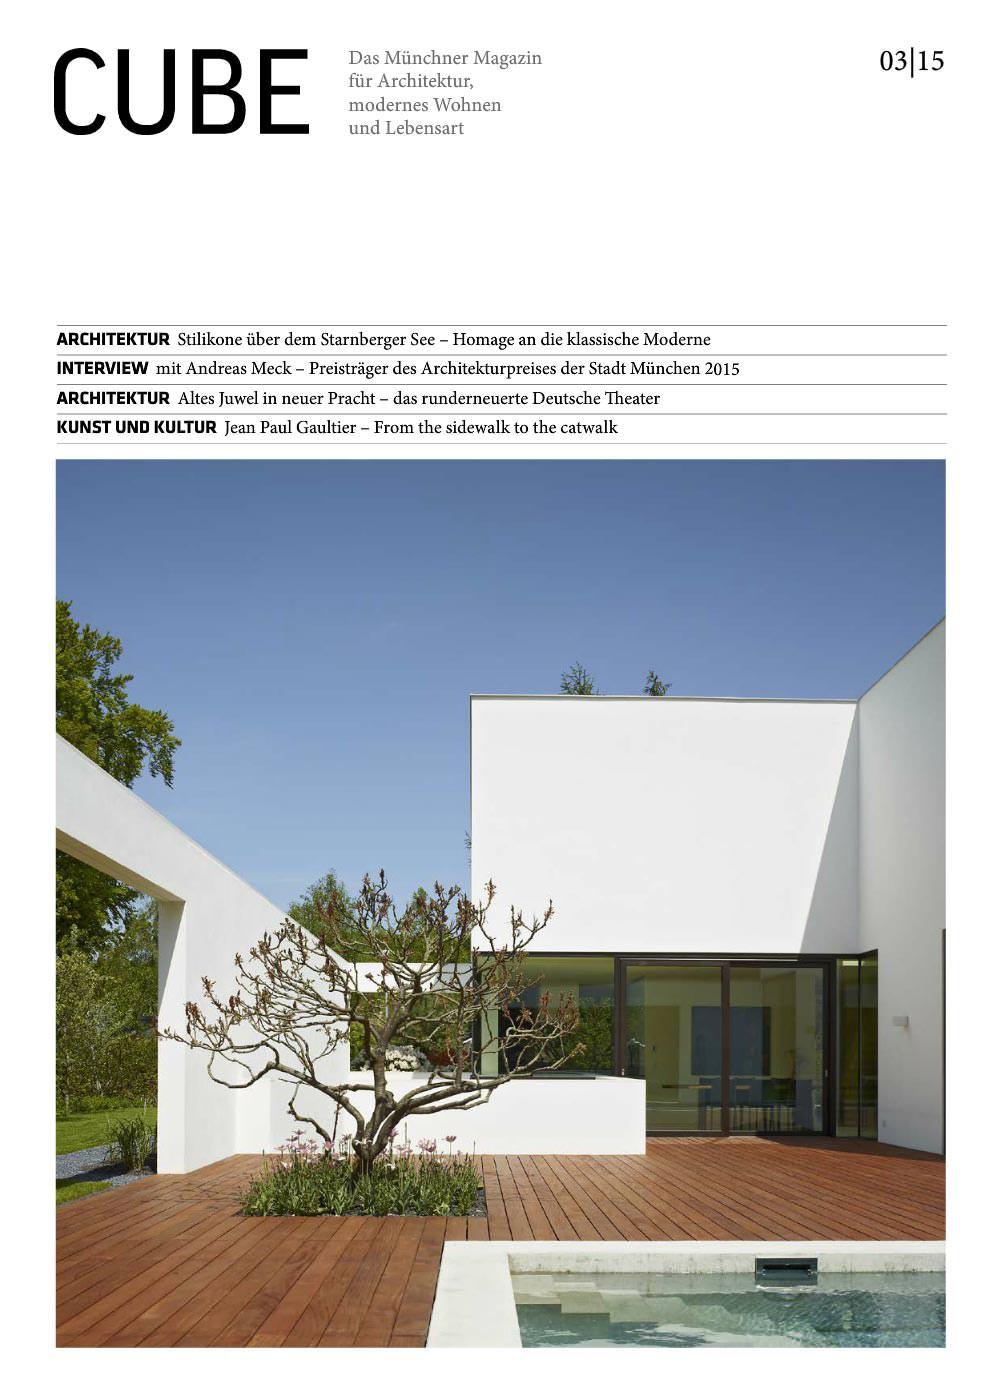 CUBE Magazine - Hauck & Aufhäuser | CBA Clemens Bachmann Architects ...